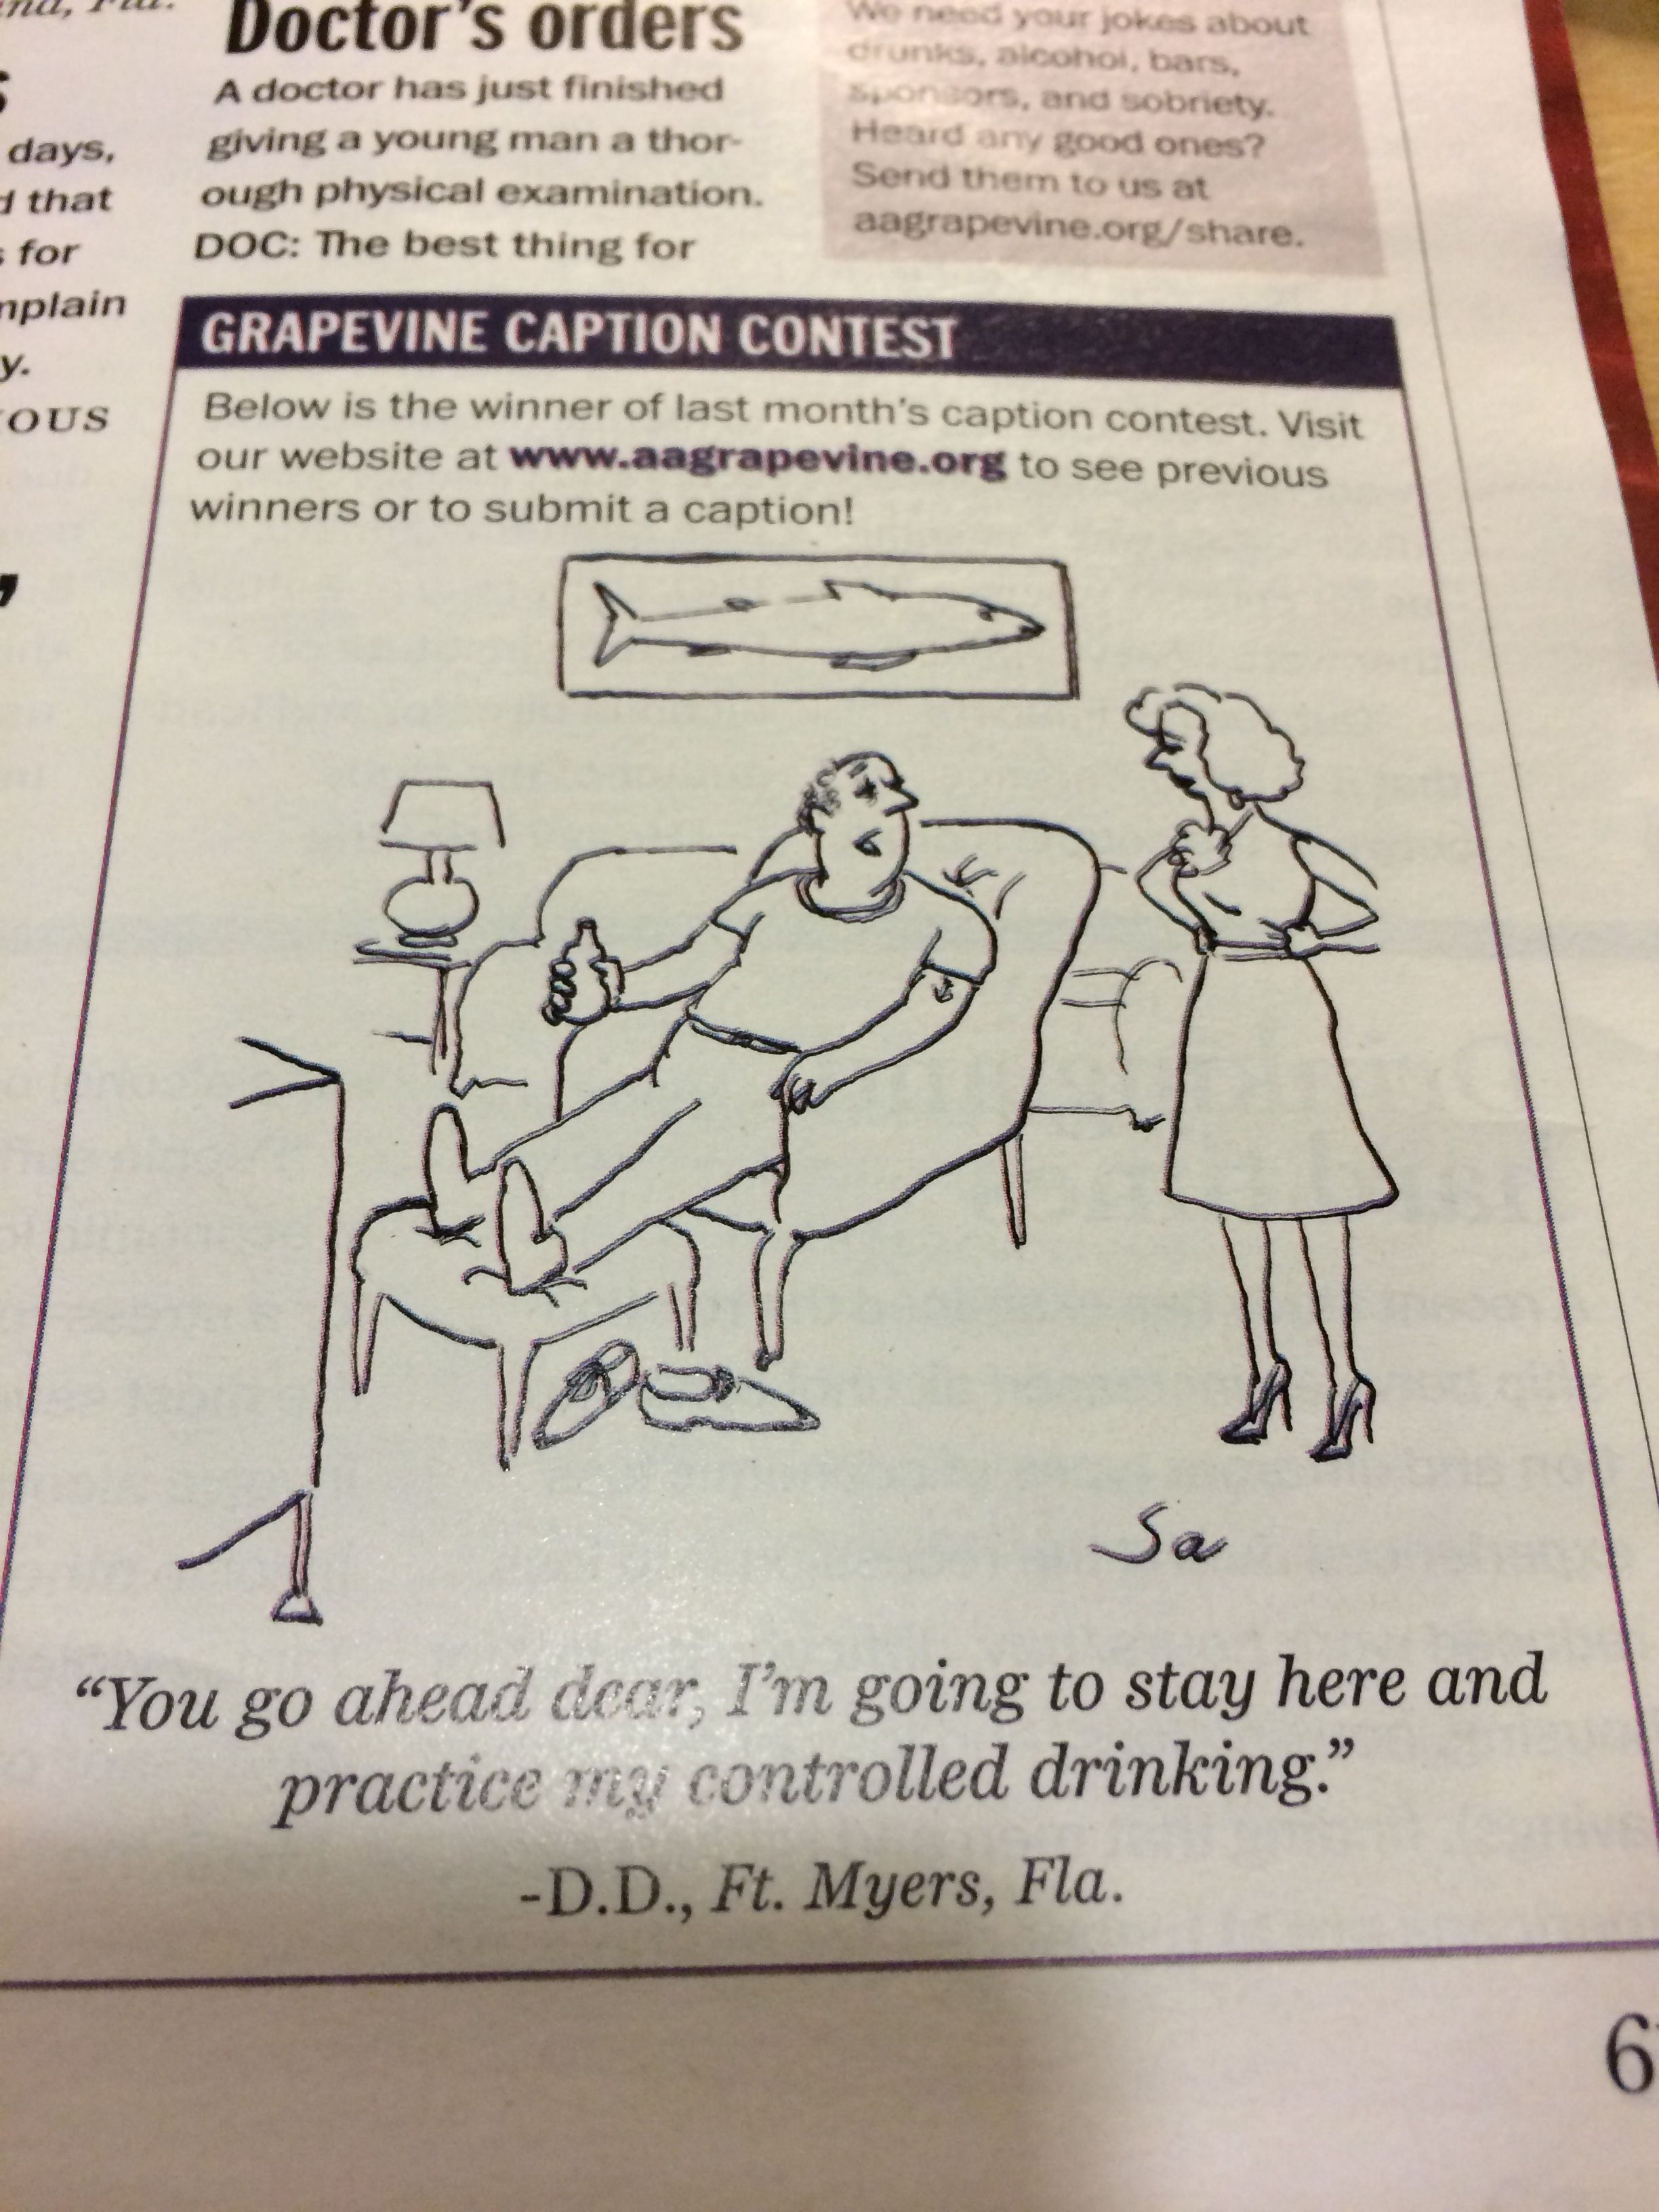 Aa Grapevine Jokes : grapevine, jokes, Addictions/Recovery/Sarcasm, Humor